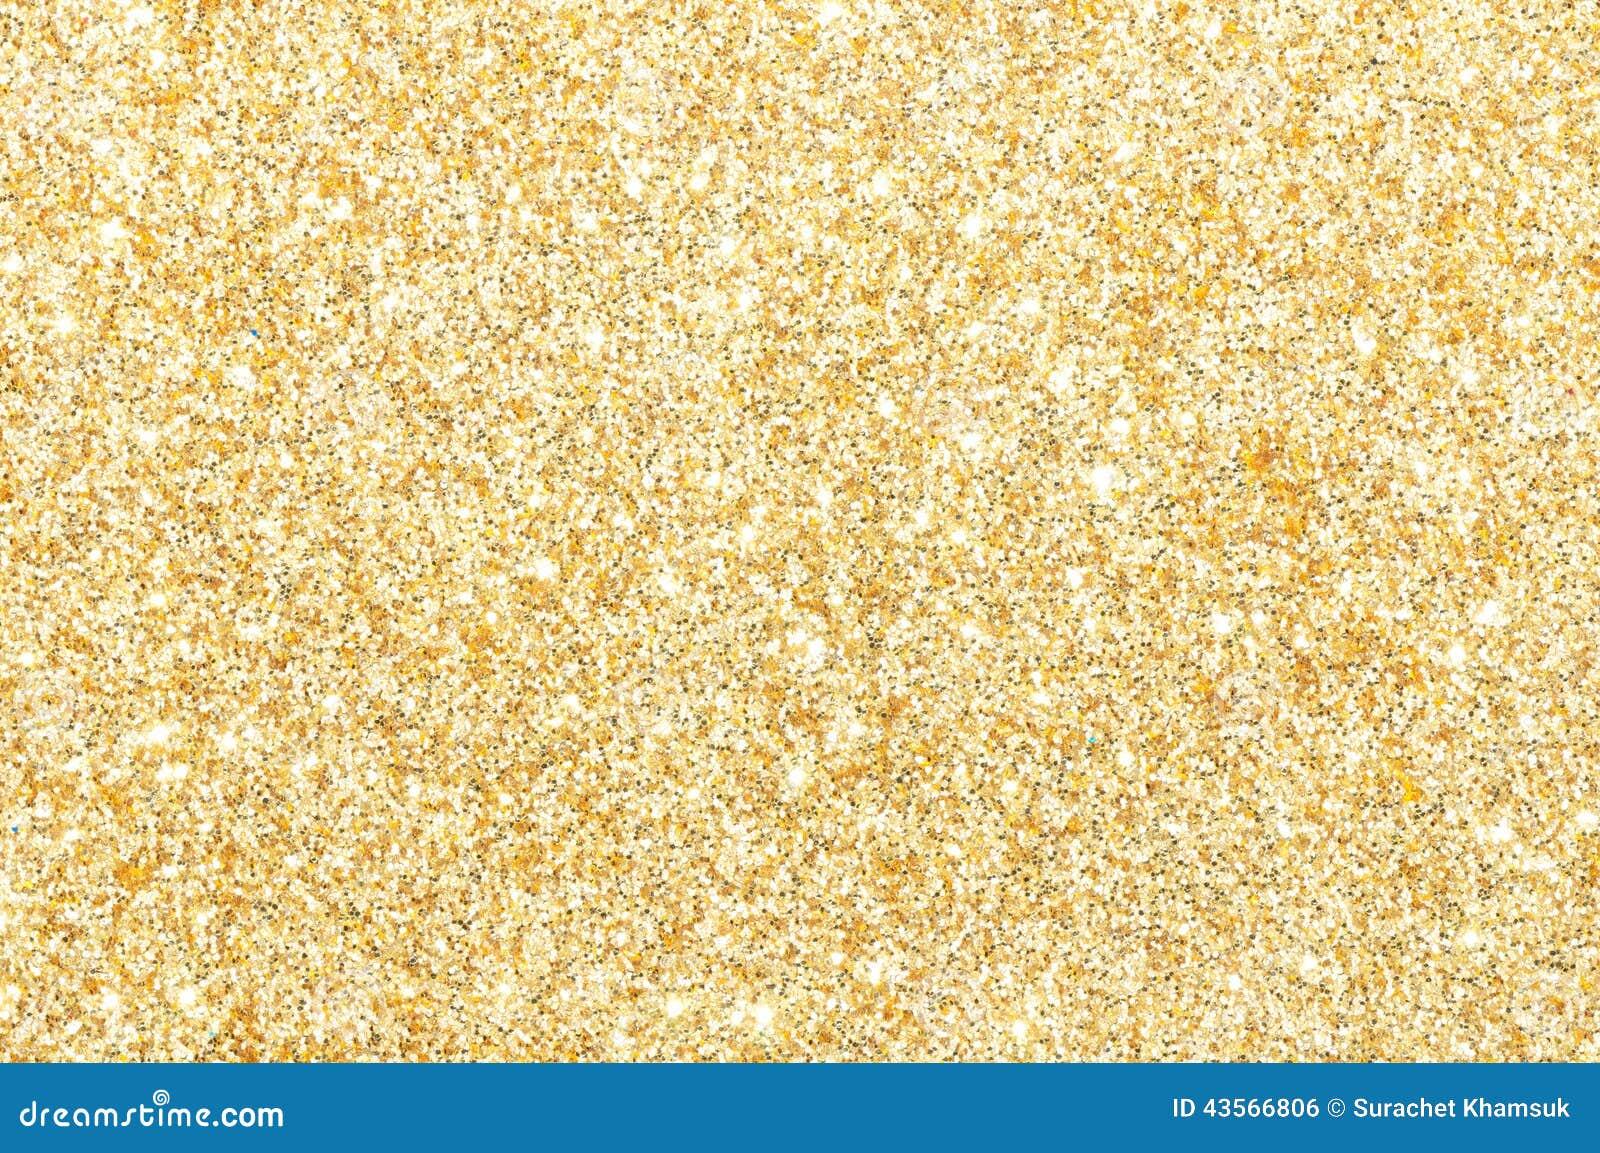 Golden Glitter Texture Background Stock Photo - Image: 43566806